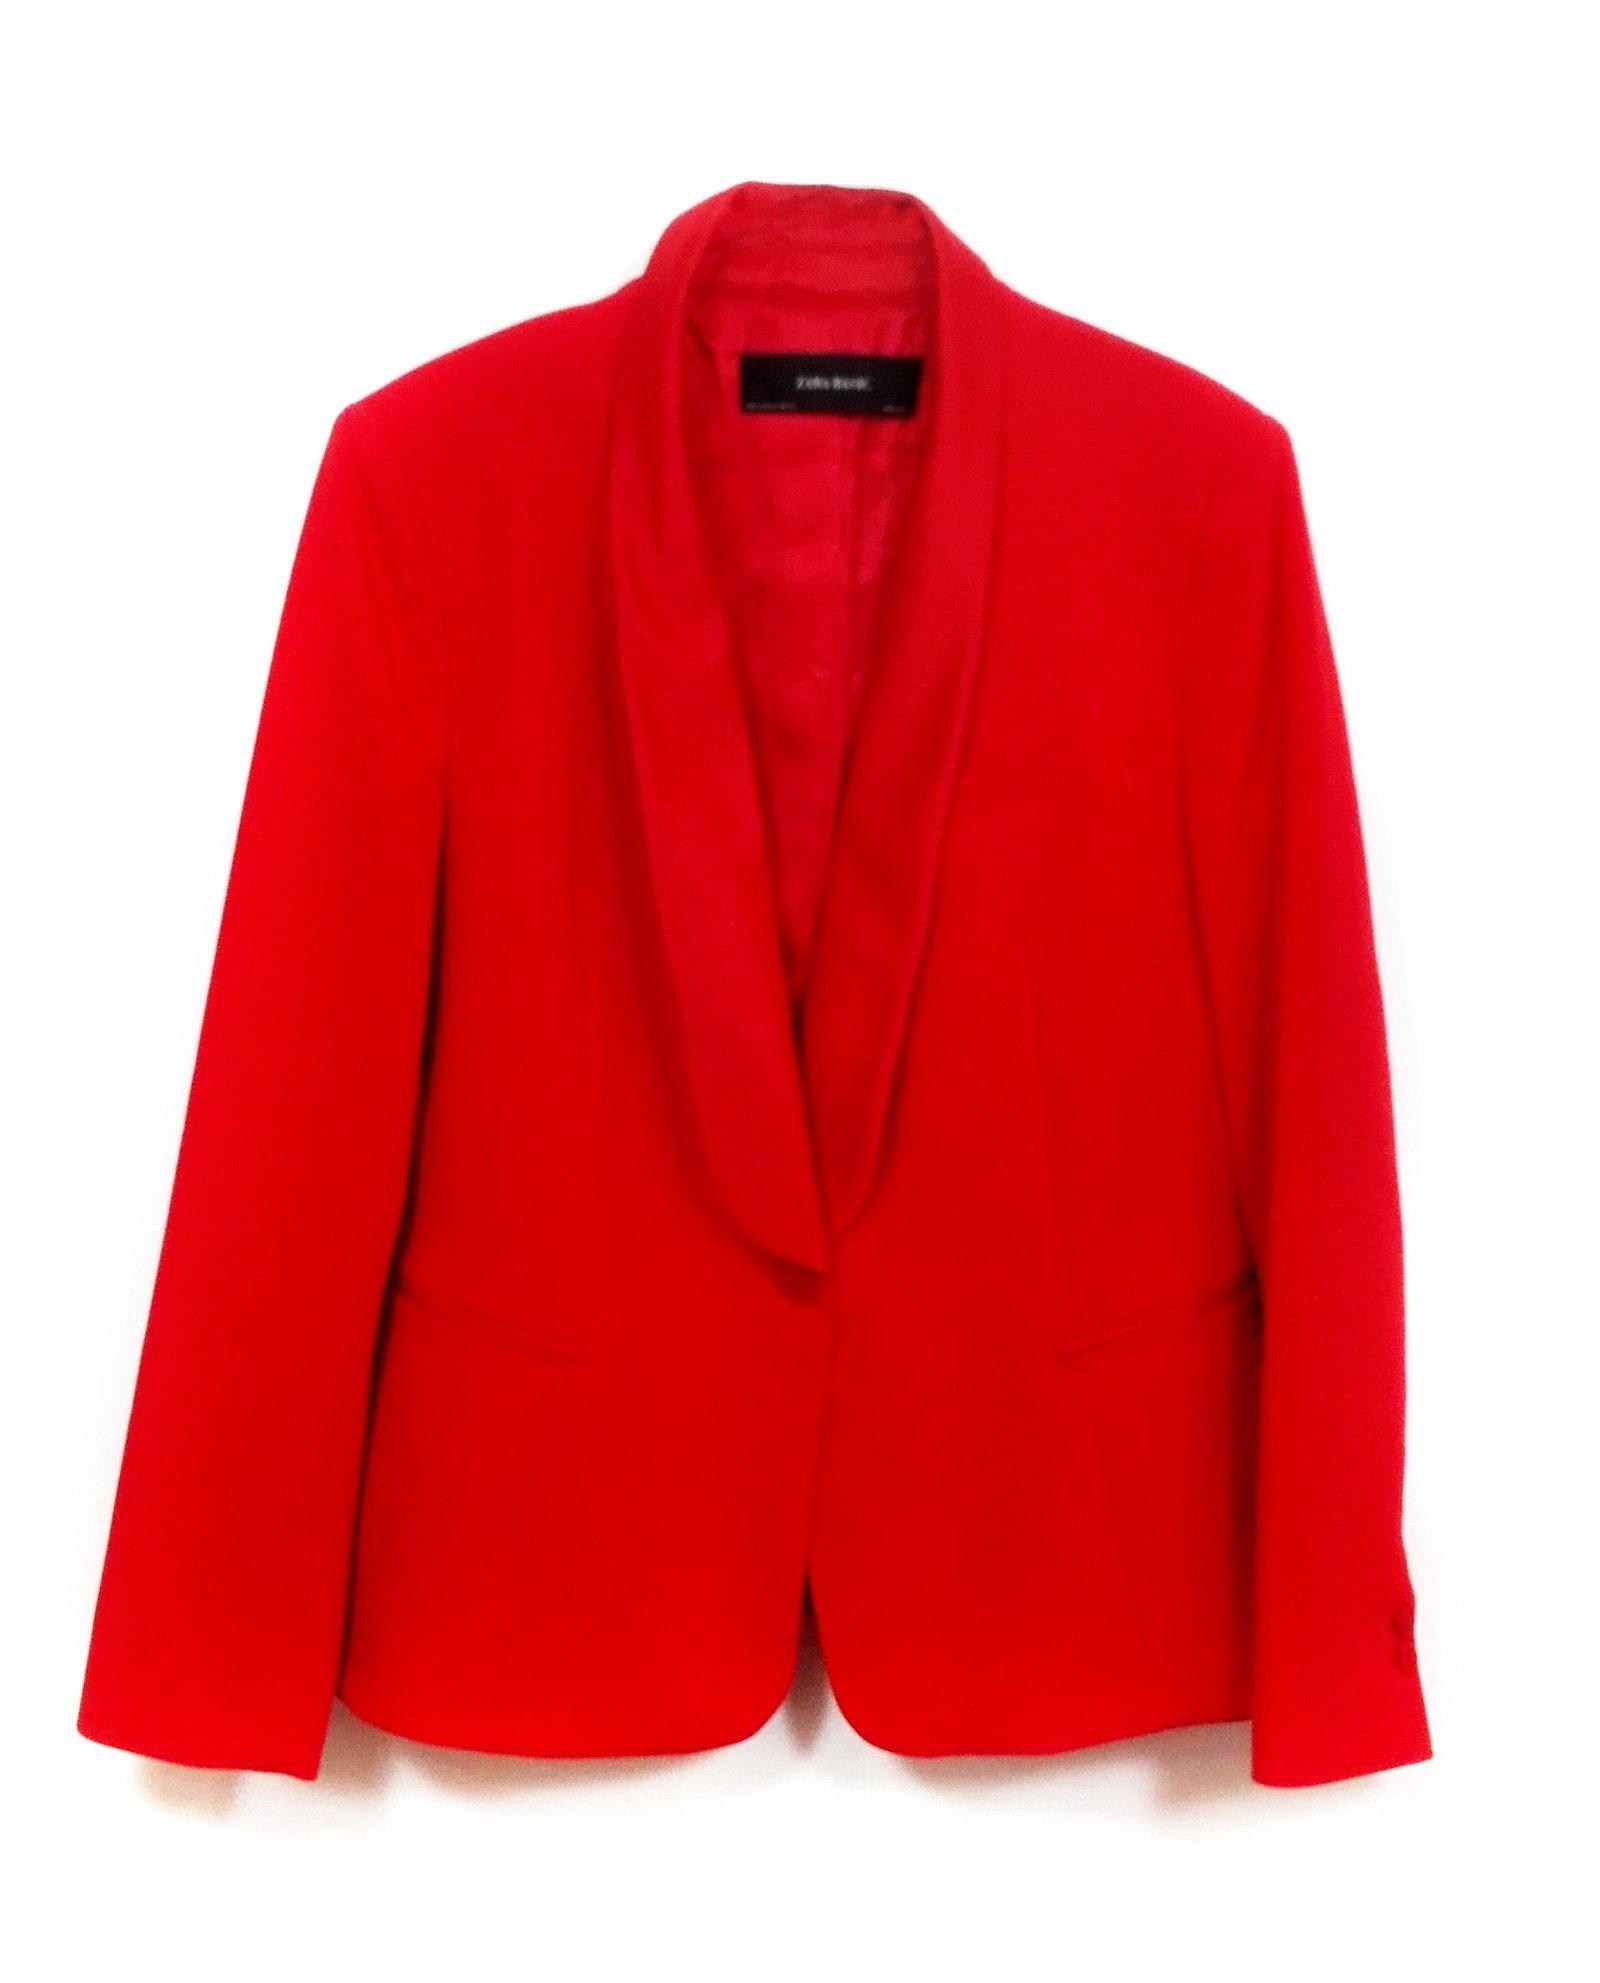 Zara Women Tuxedo Style Blazer 2173/783 (Small)